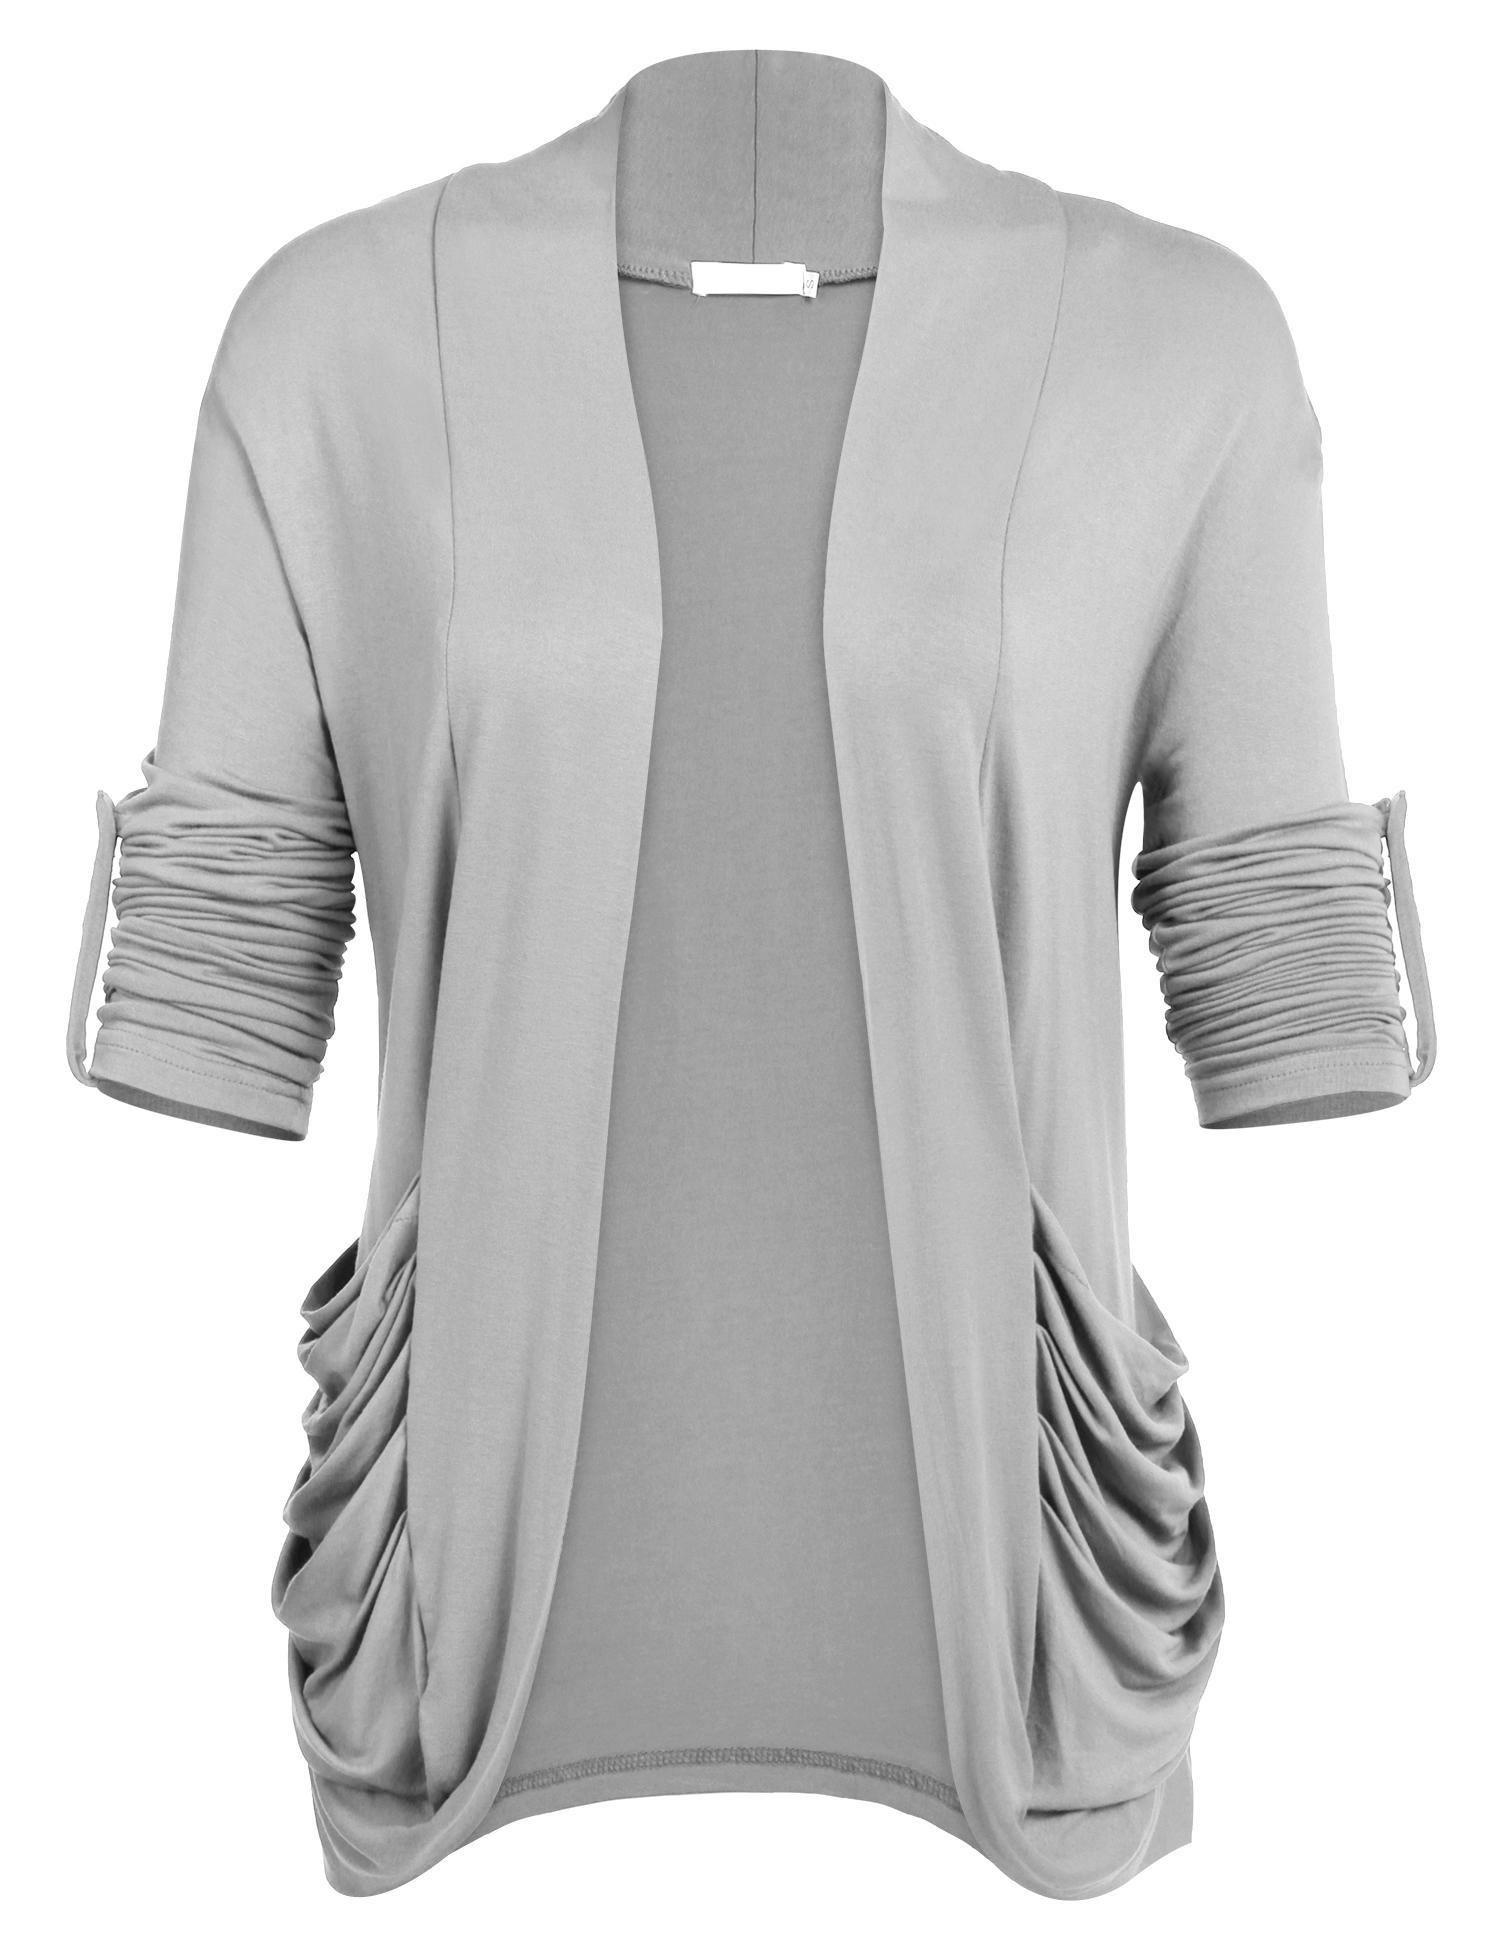 Zeagoo Women's Plus Size Long Sleeve Semi Sheer Draped Front Flyaway Cardigan Gray L